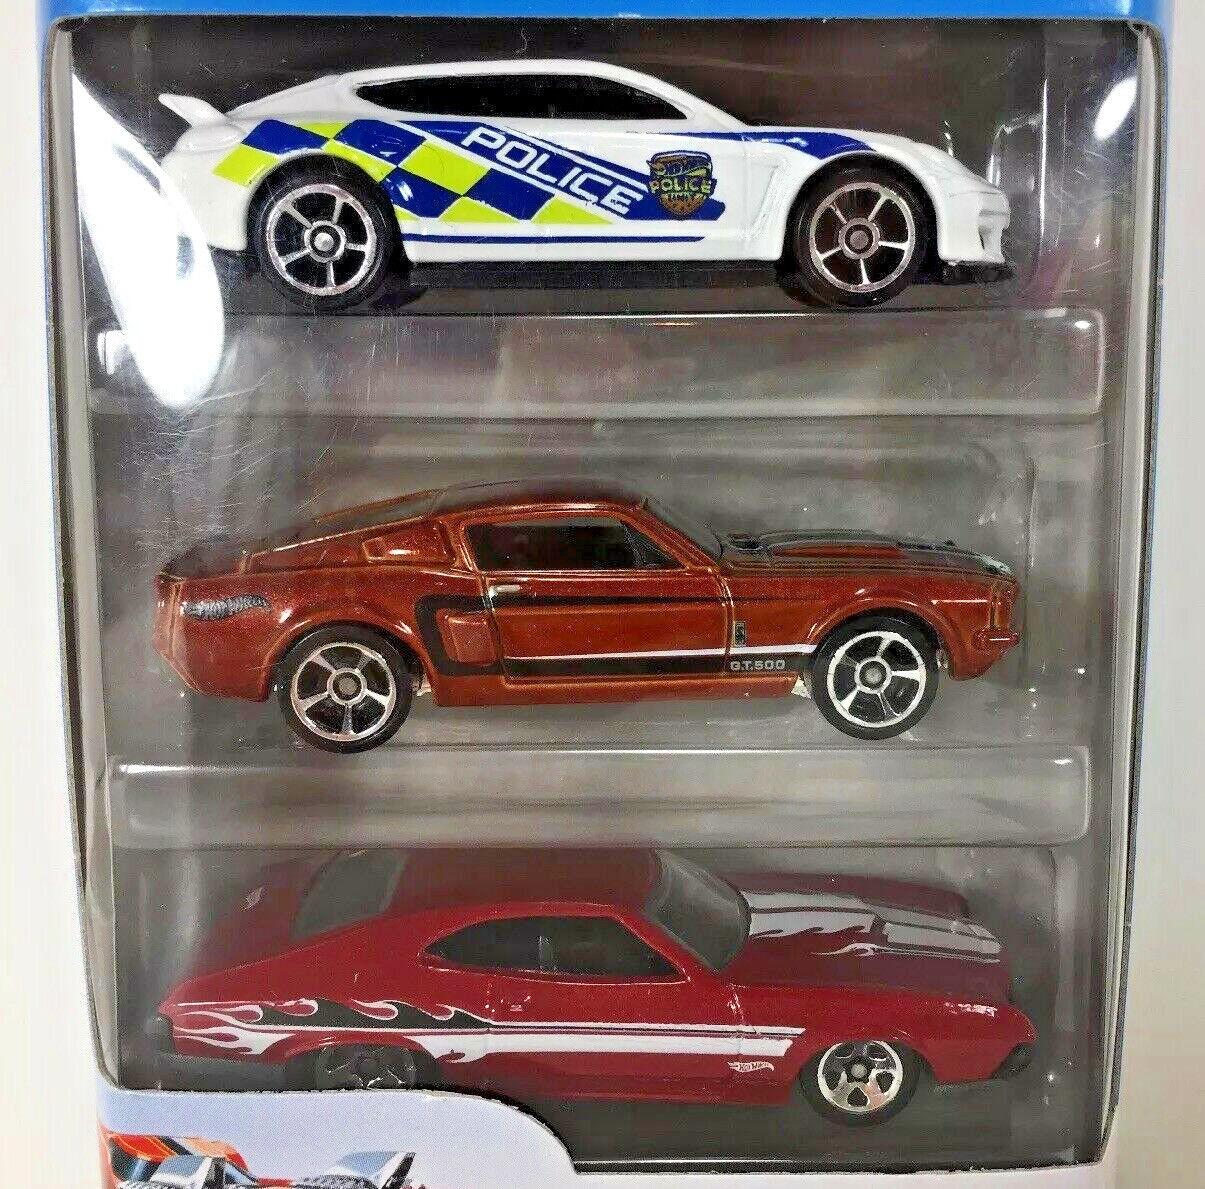 New Hot Wheels 3 Assorted Car Pack Die Cast Metal Cars Porsc